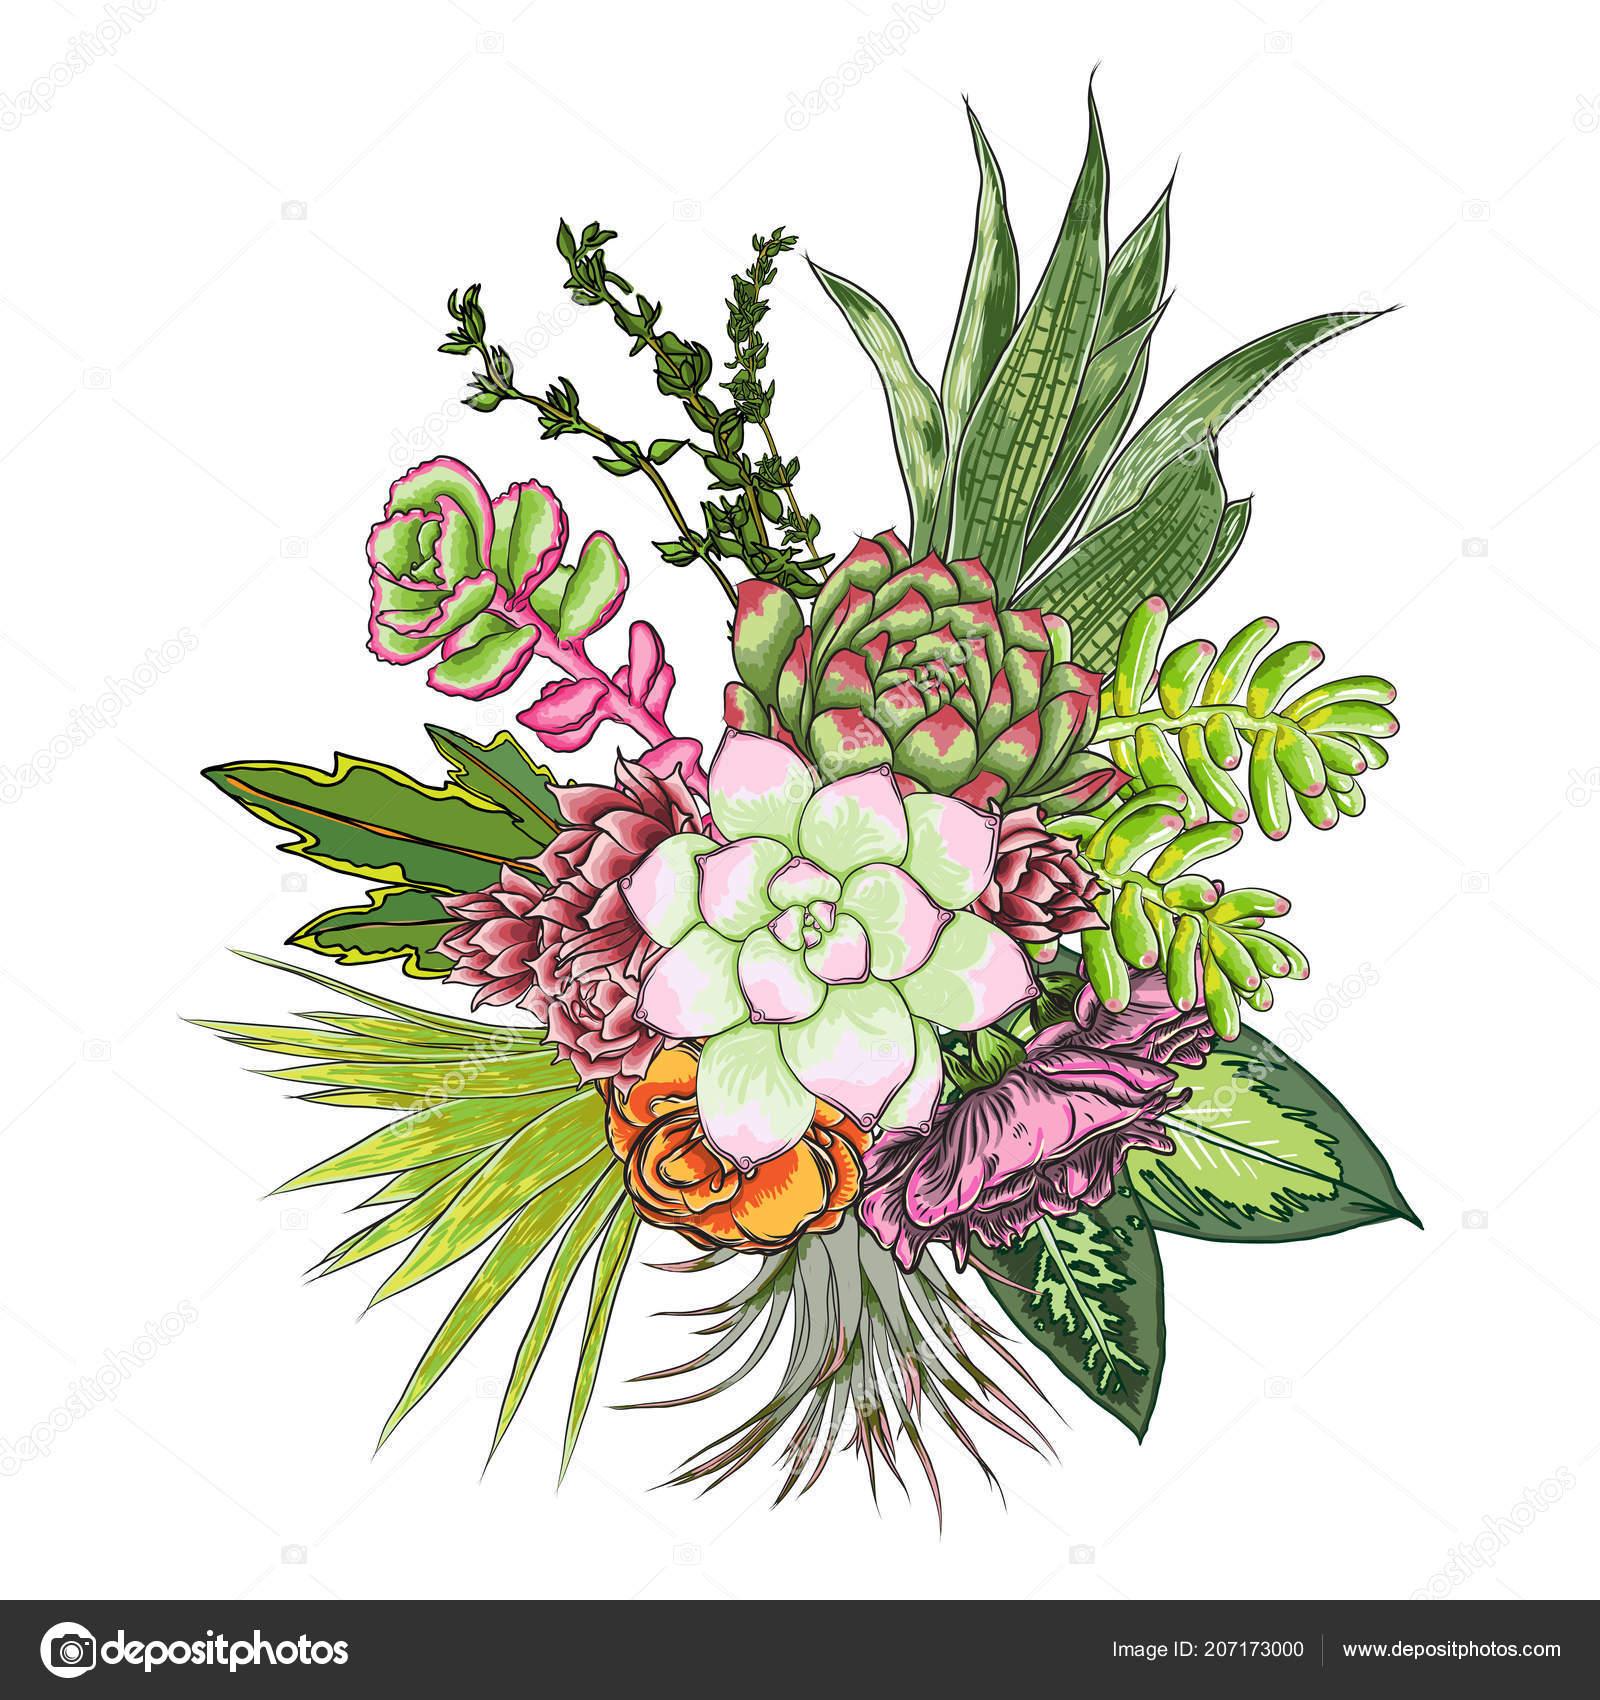 Green Colorful Succulent Echeveria Design Bouquet Imitation Watercolor Natural Cactus Stock Vector C Goldenshrimp 207173000